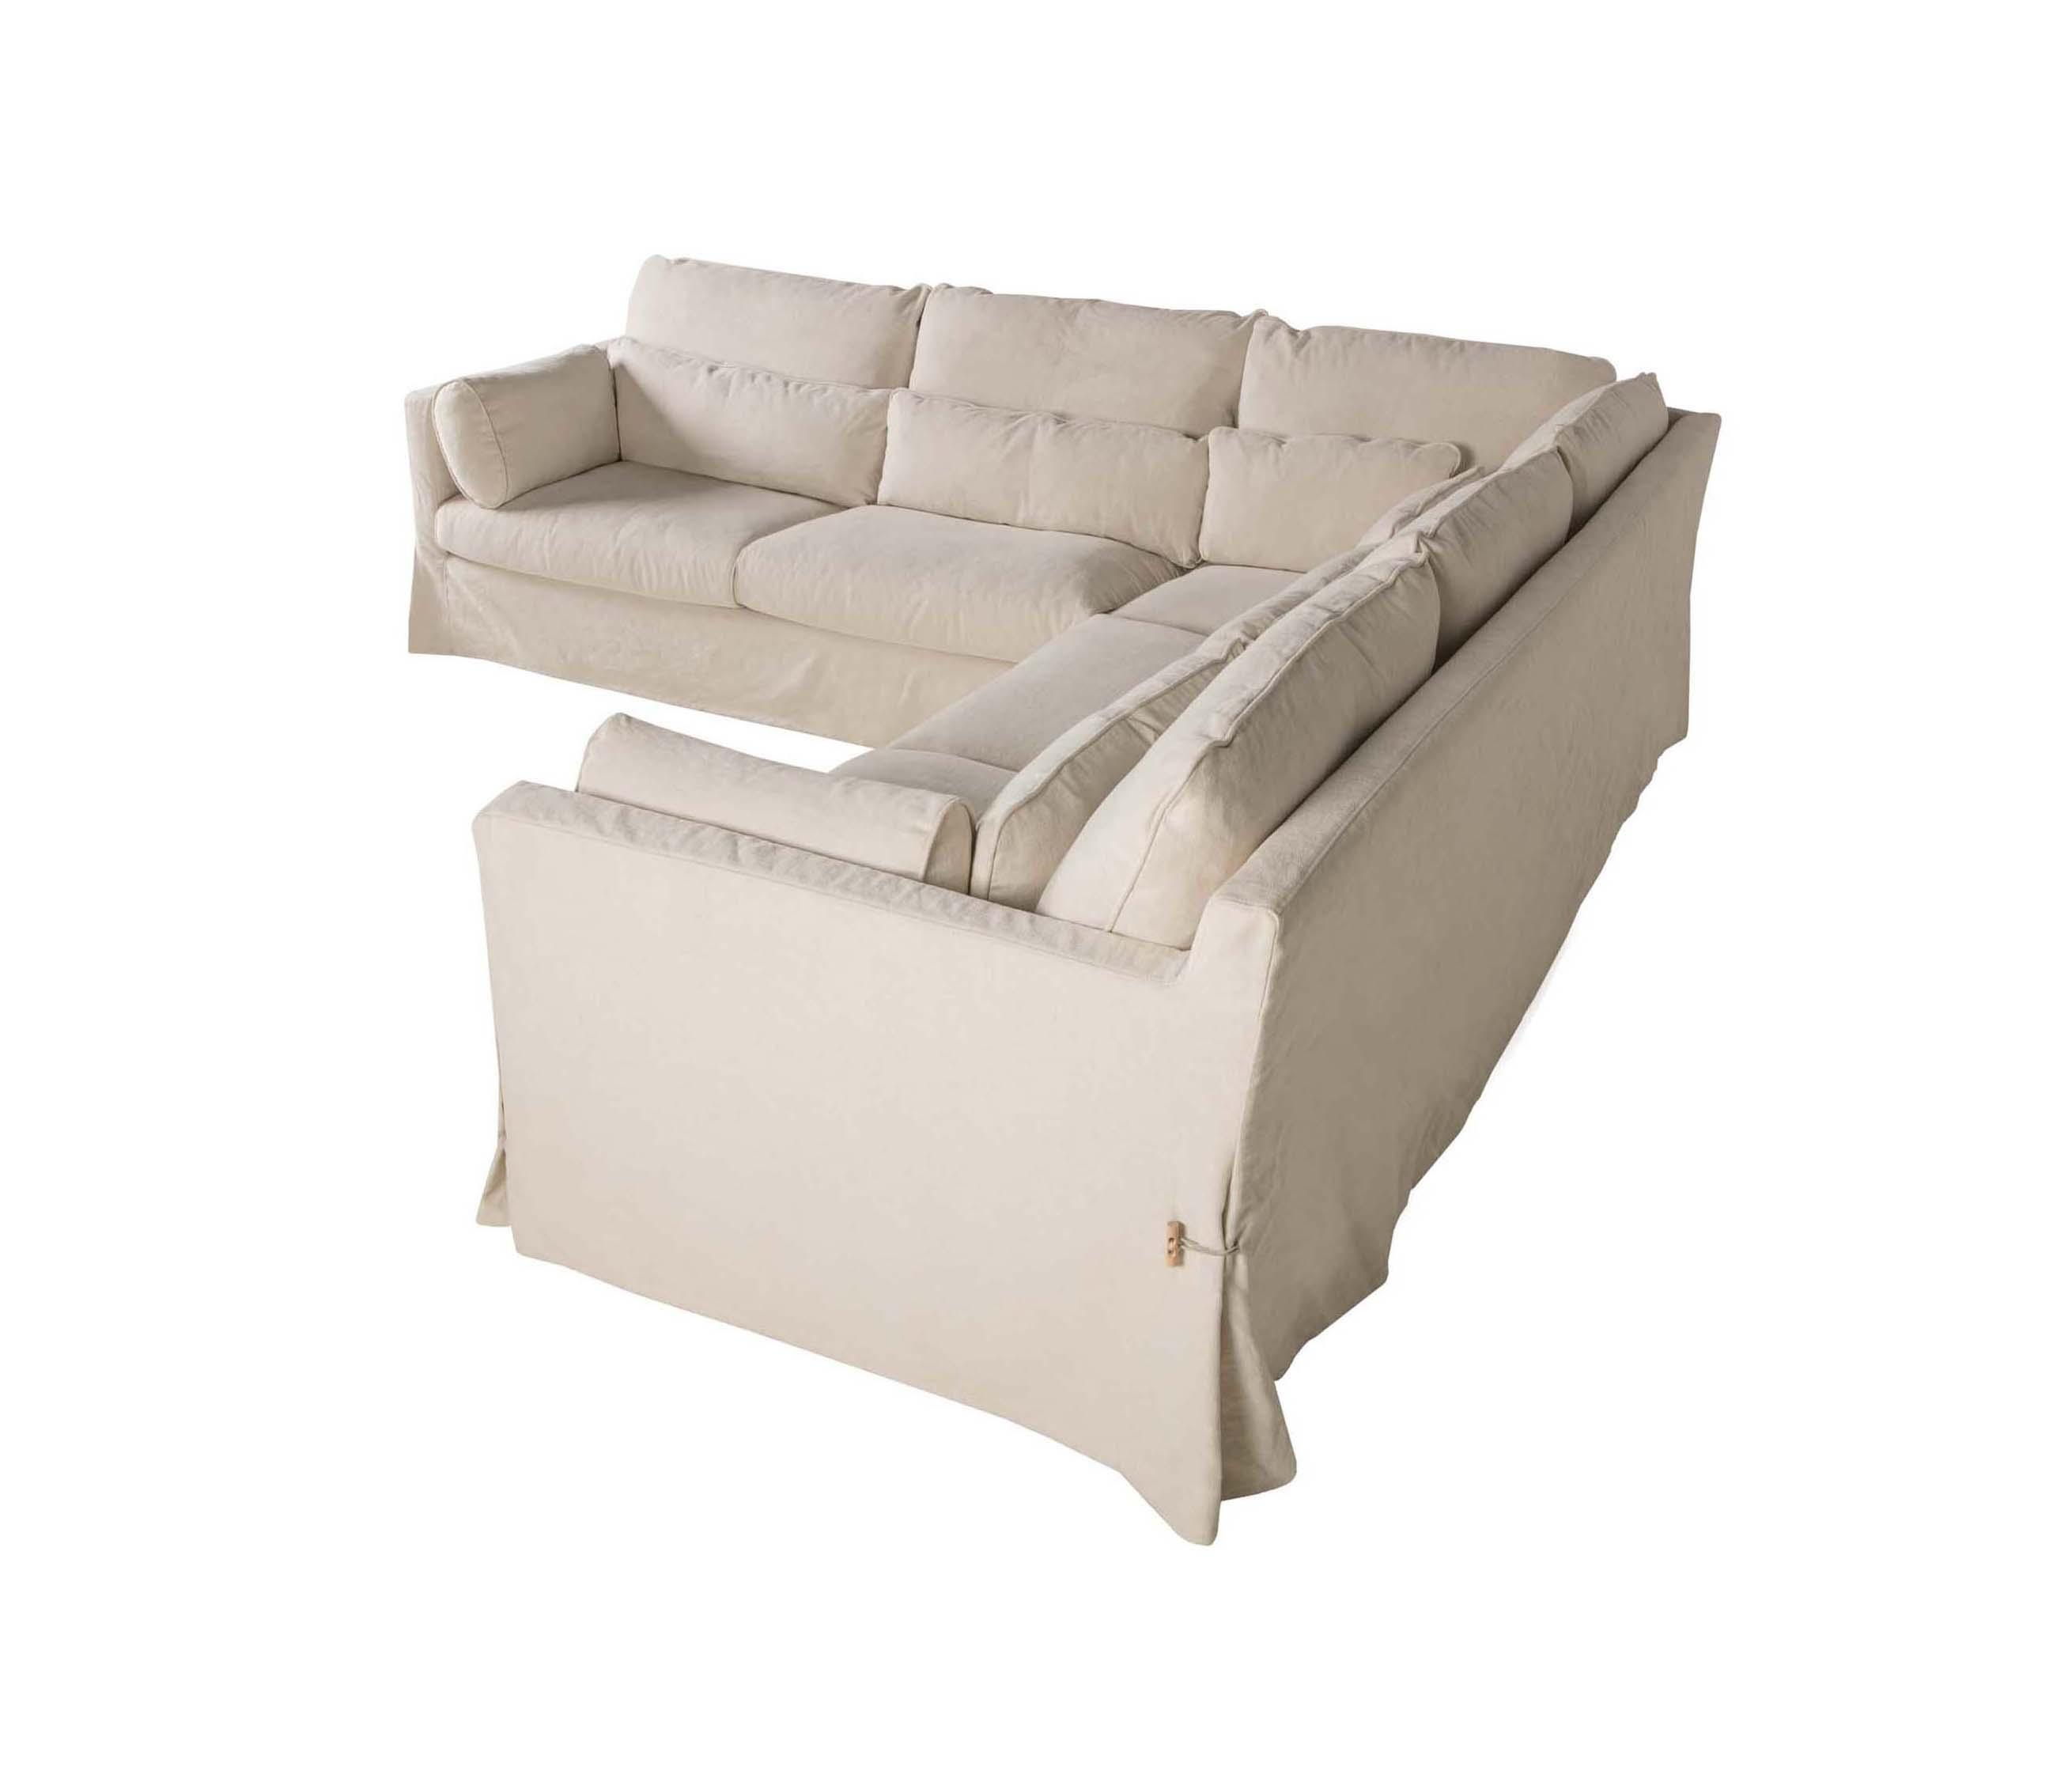 sara sofas von sits architonic. Black Bedroom Furniture Sets. Home Design Ideas